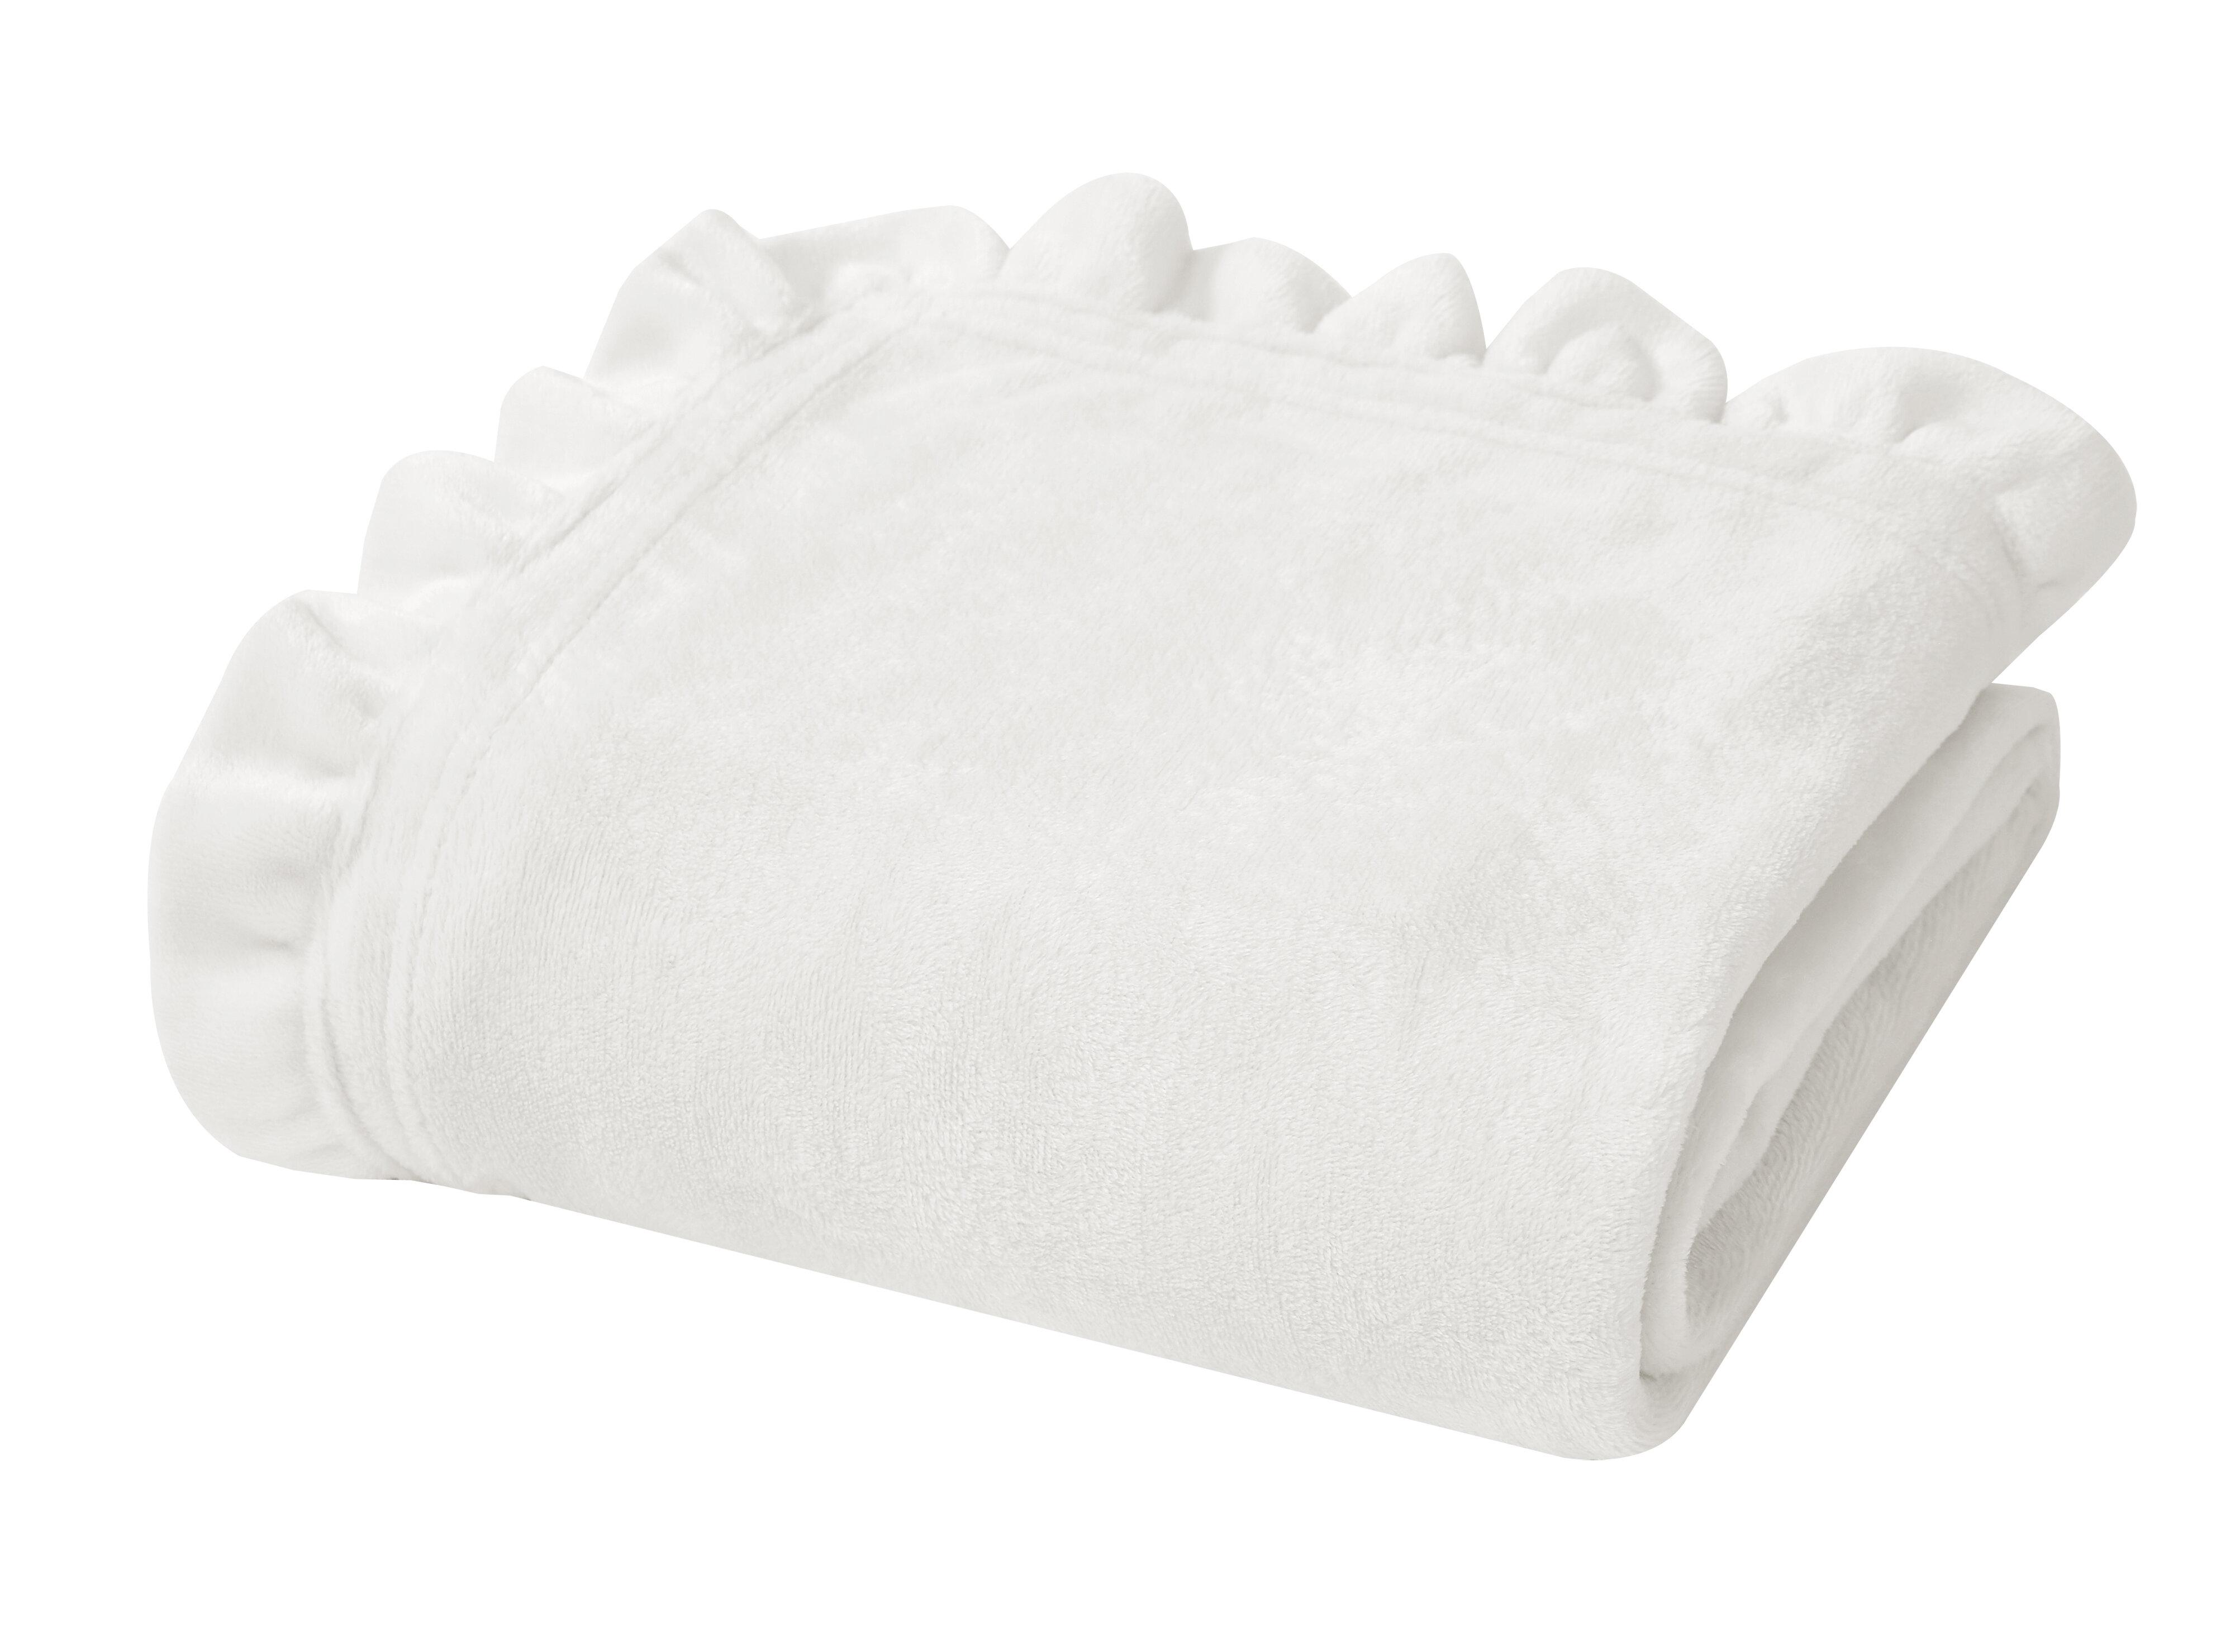 Fleece Microfiber White Blankets Throws You Ll Love In 2021 Wayfair